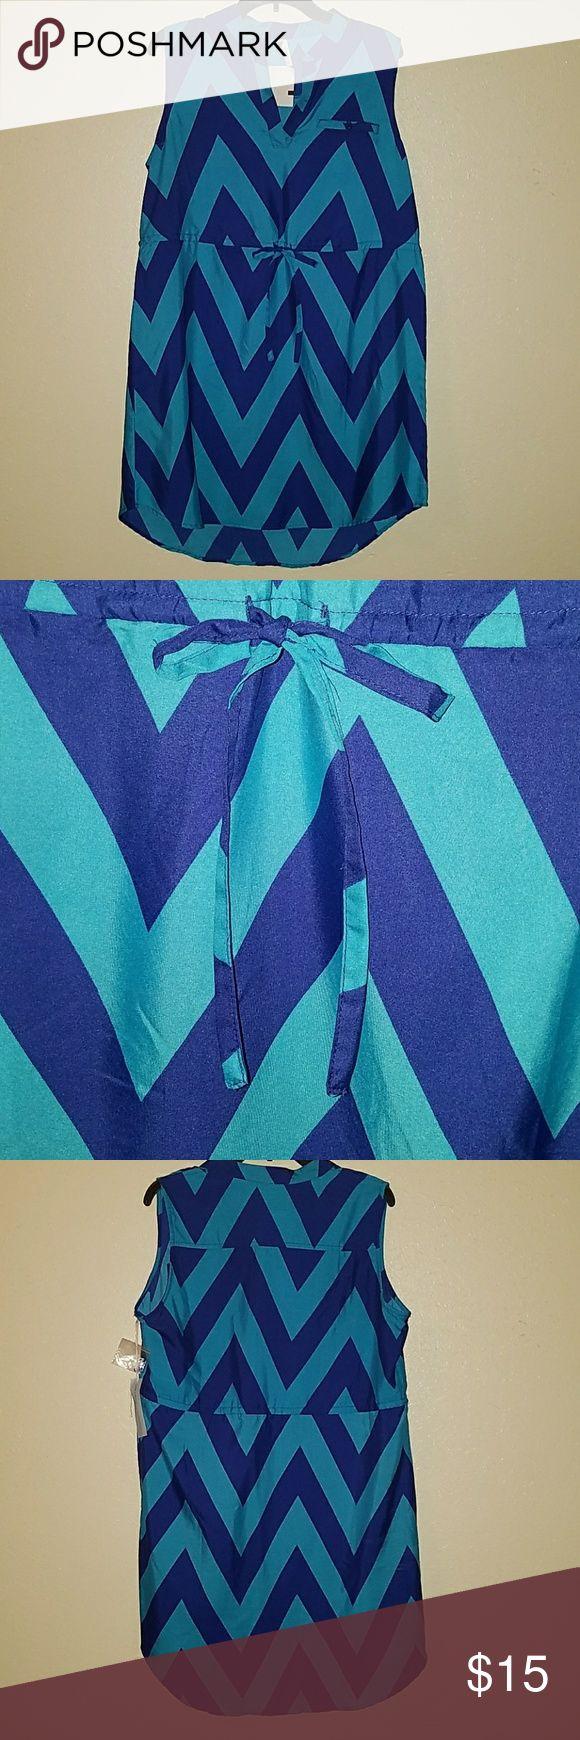 New dress New Sleveless two toned blue chevron design dress Dresses Mini